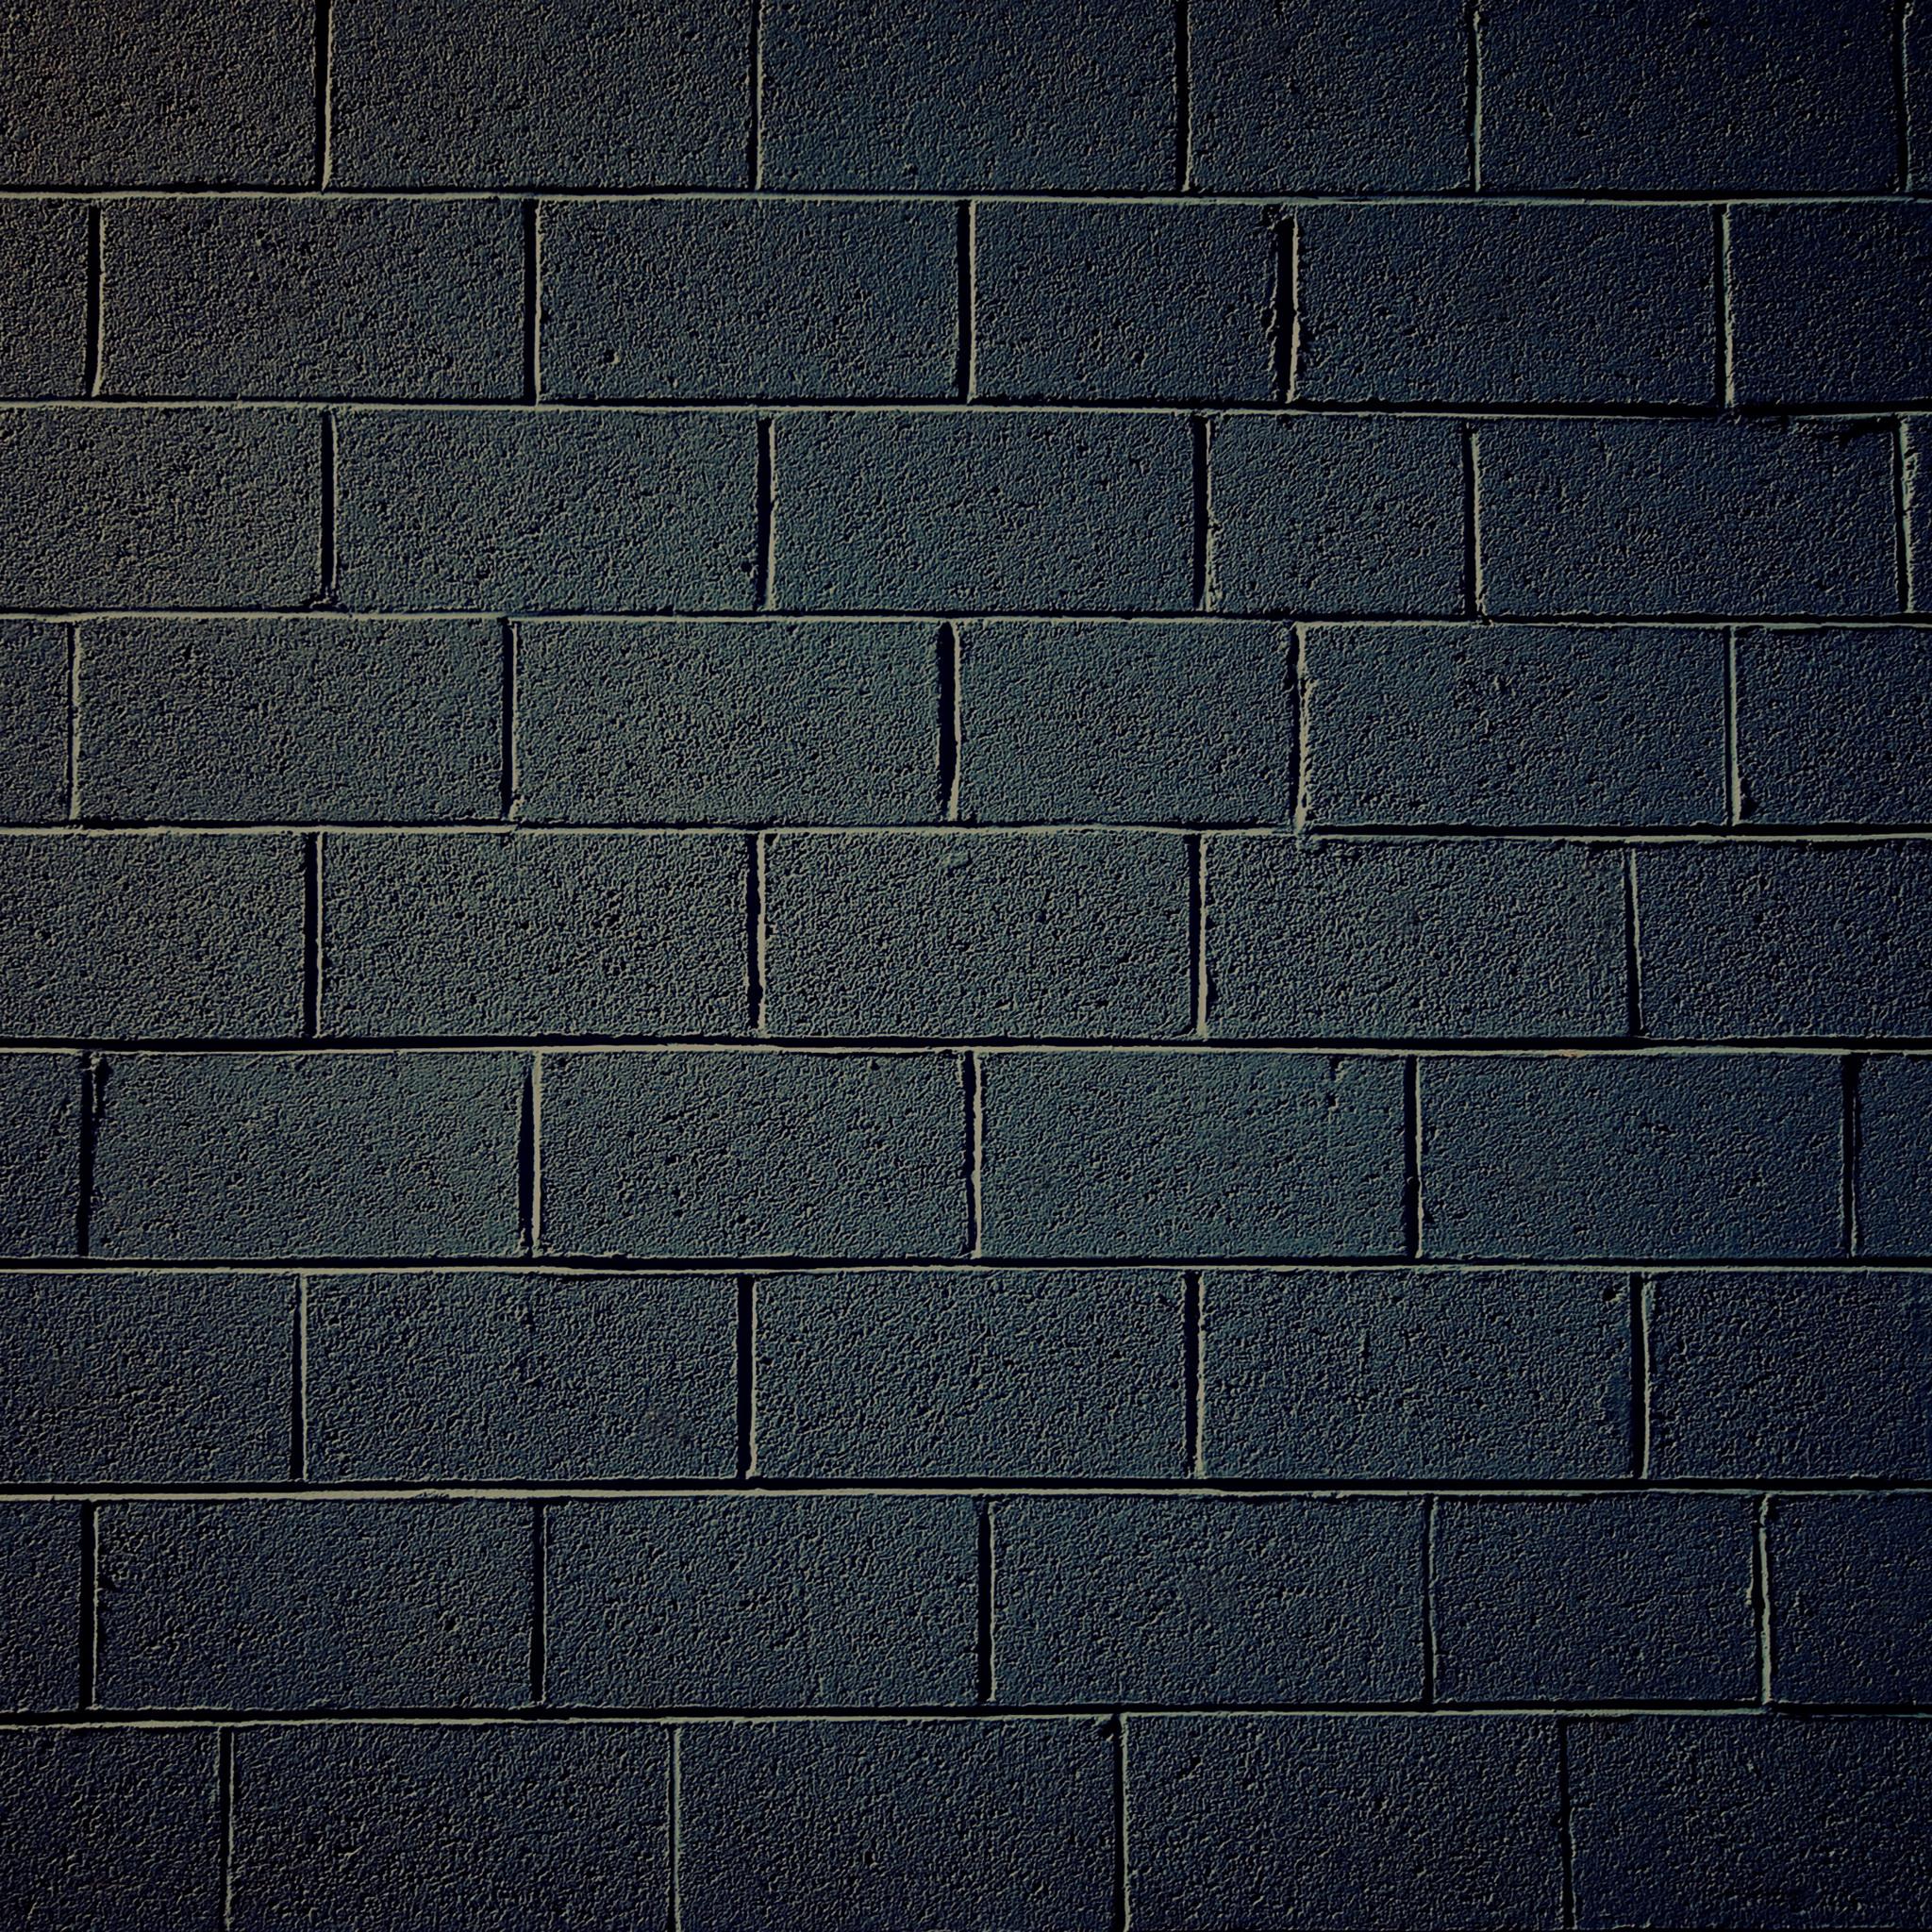 HD Hd Wallpapers For Ipad 2048x2048